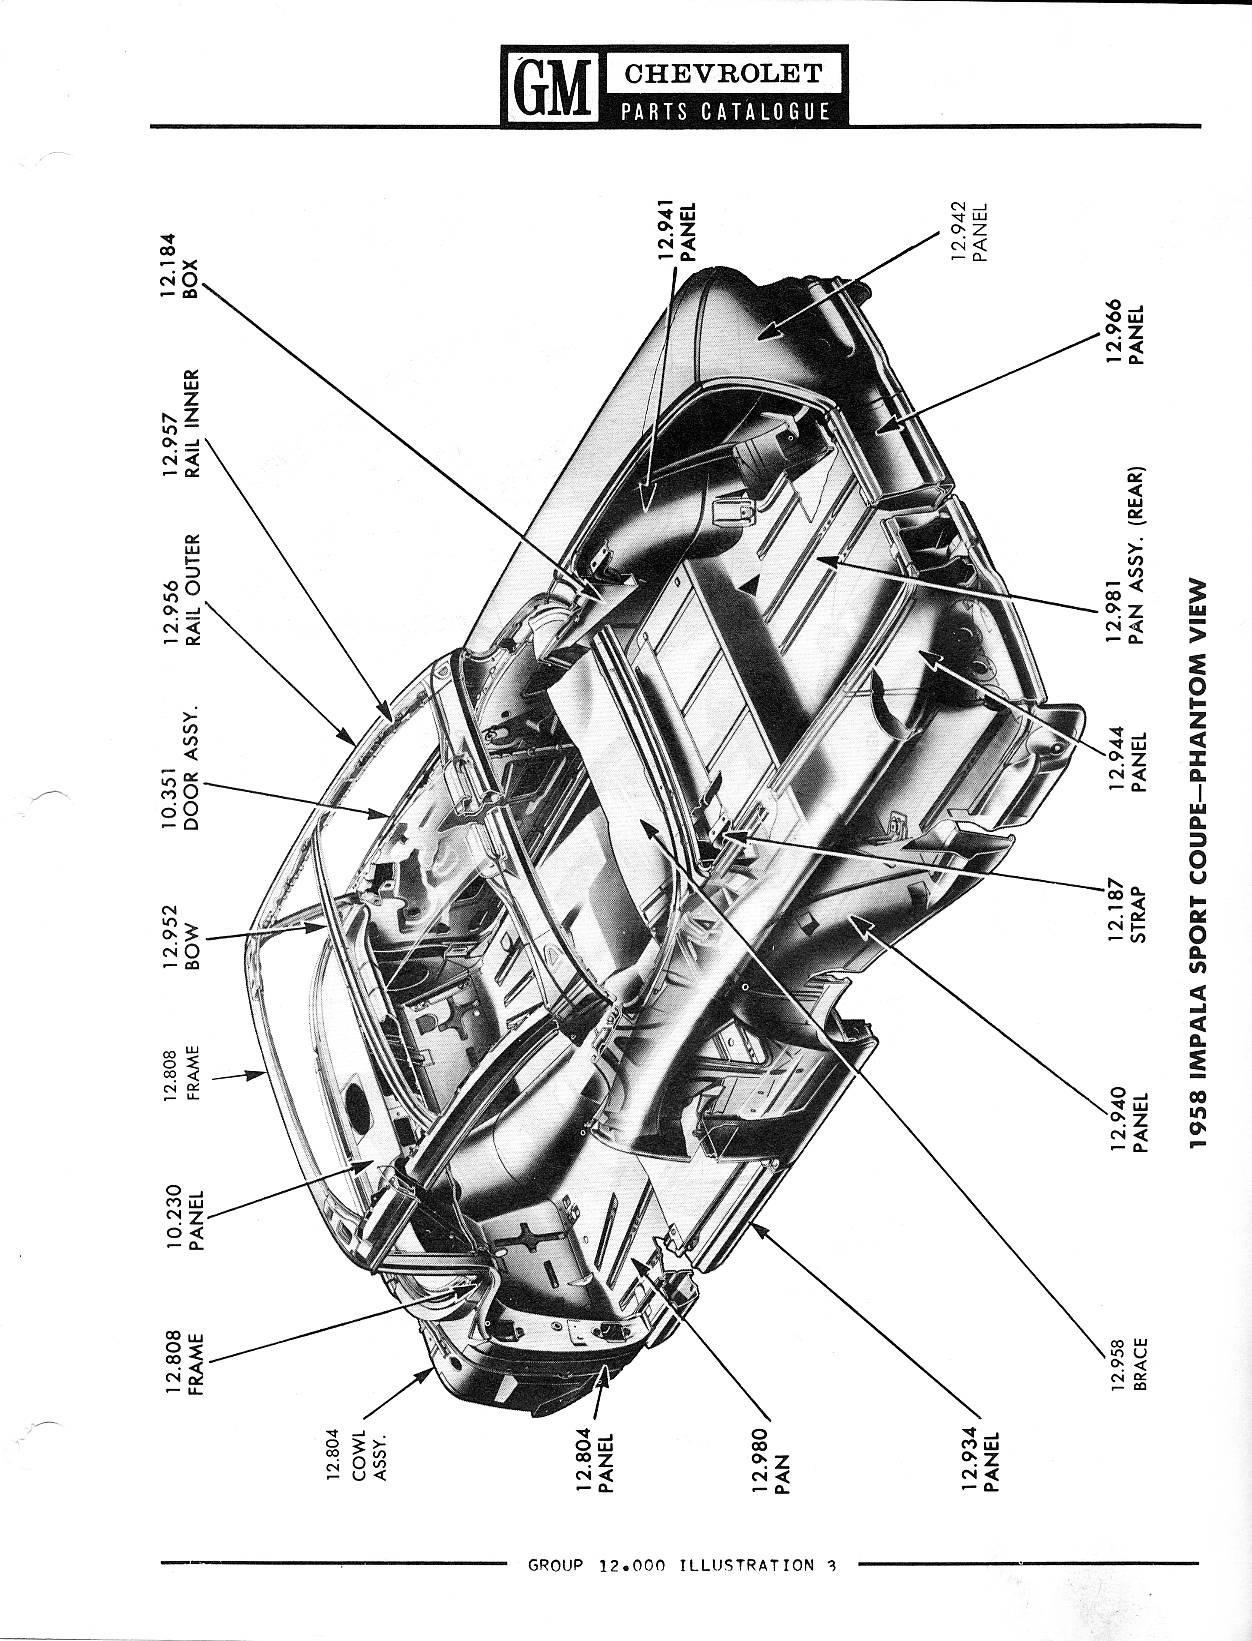 1958-1968 Chevrolet Parts Catalog / Image159.jpg